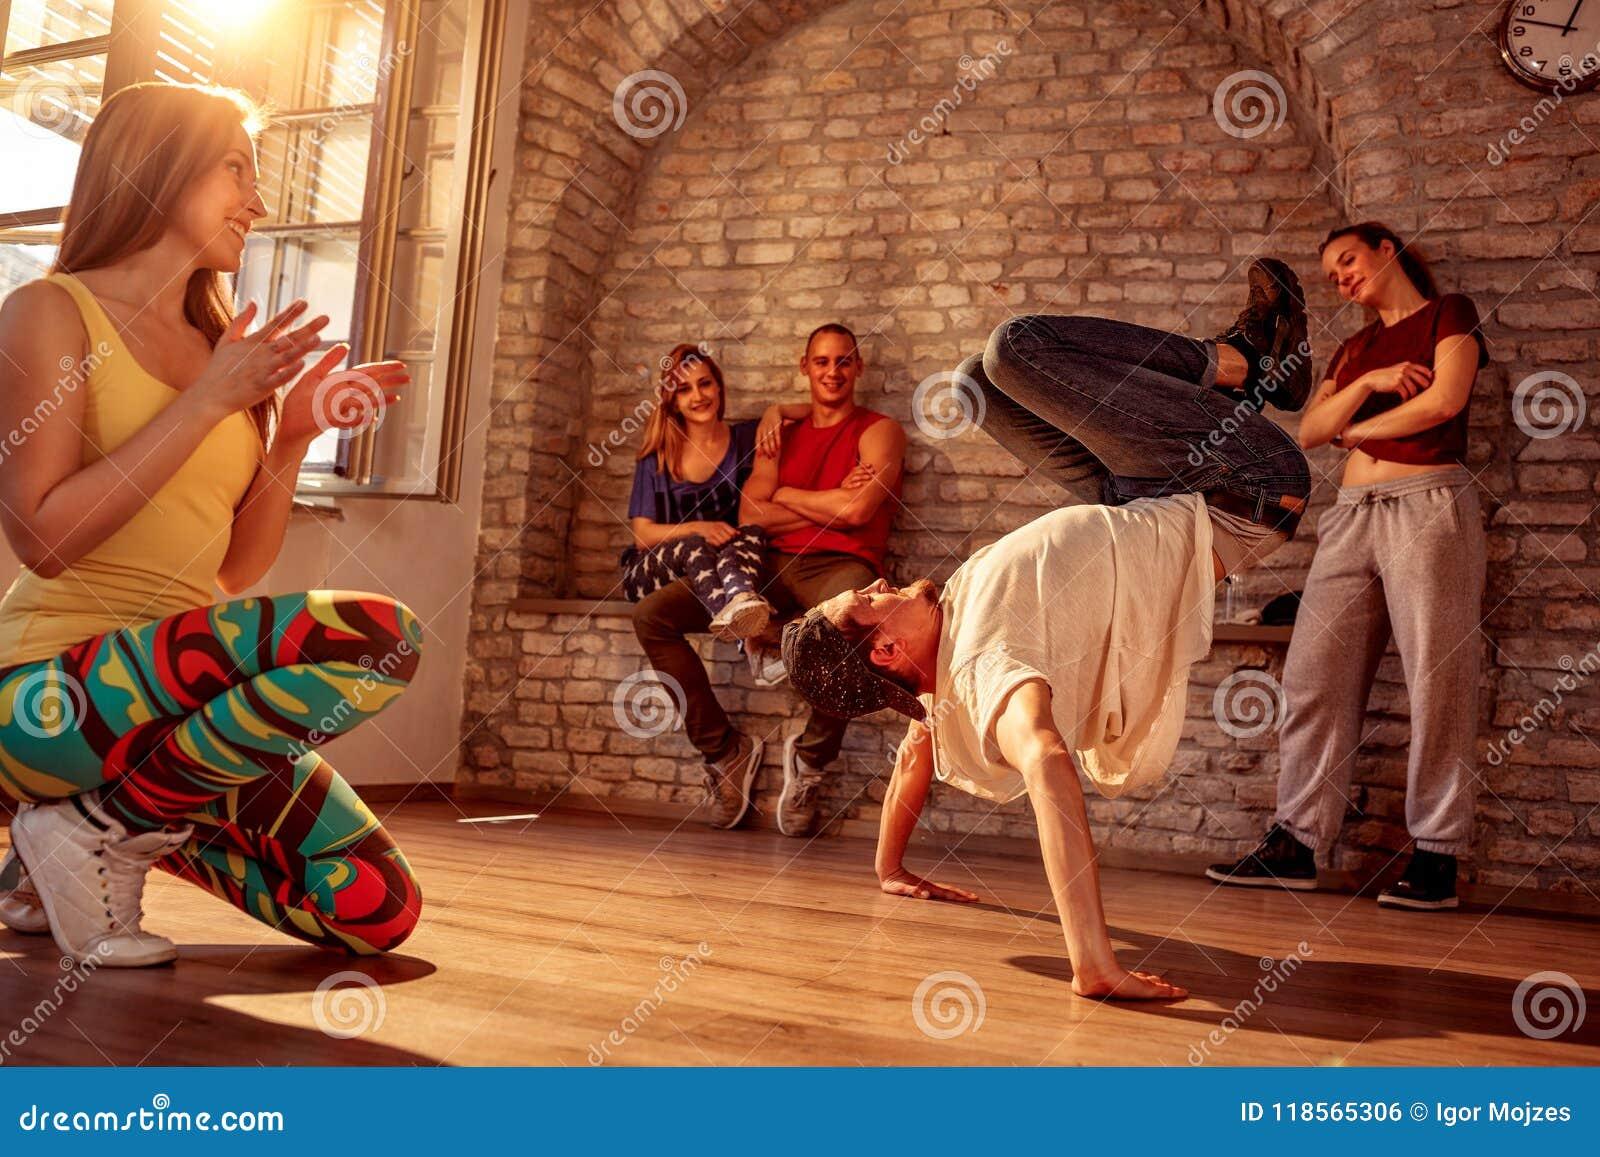 Young street artist break dancing performing moves